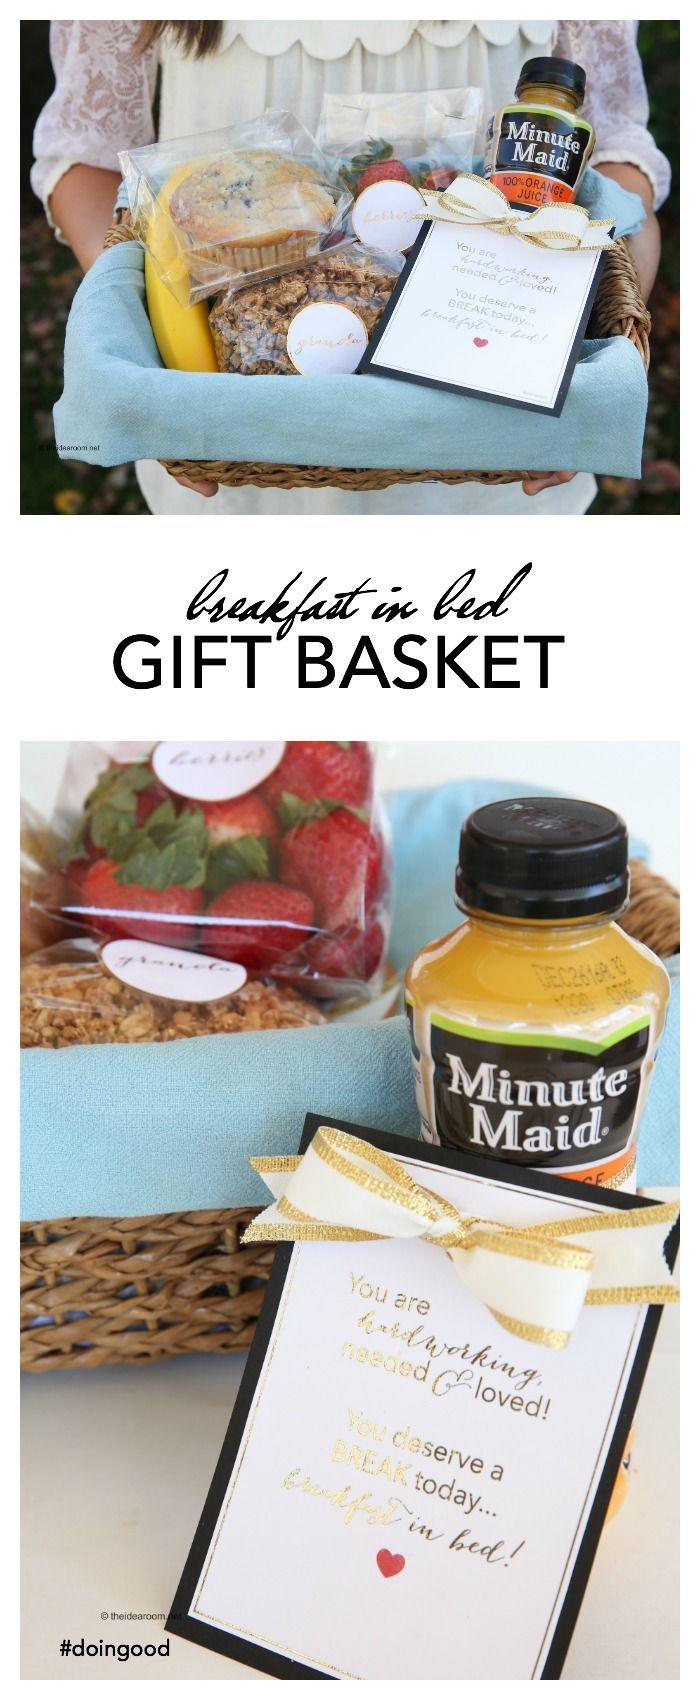 Breakfast In Bed Gift Basket Idea And Printables Breakfast Gift Breakfast Gift Basket Breakfast Basket